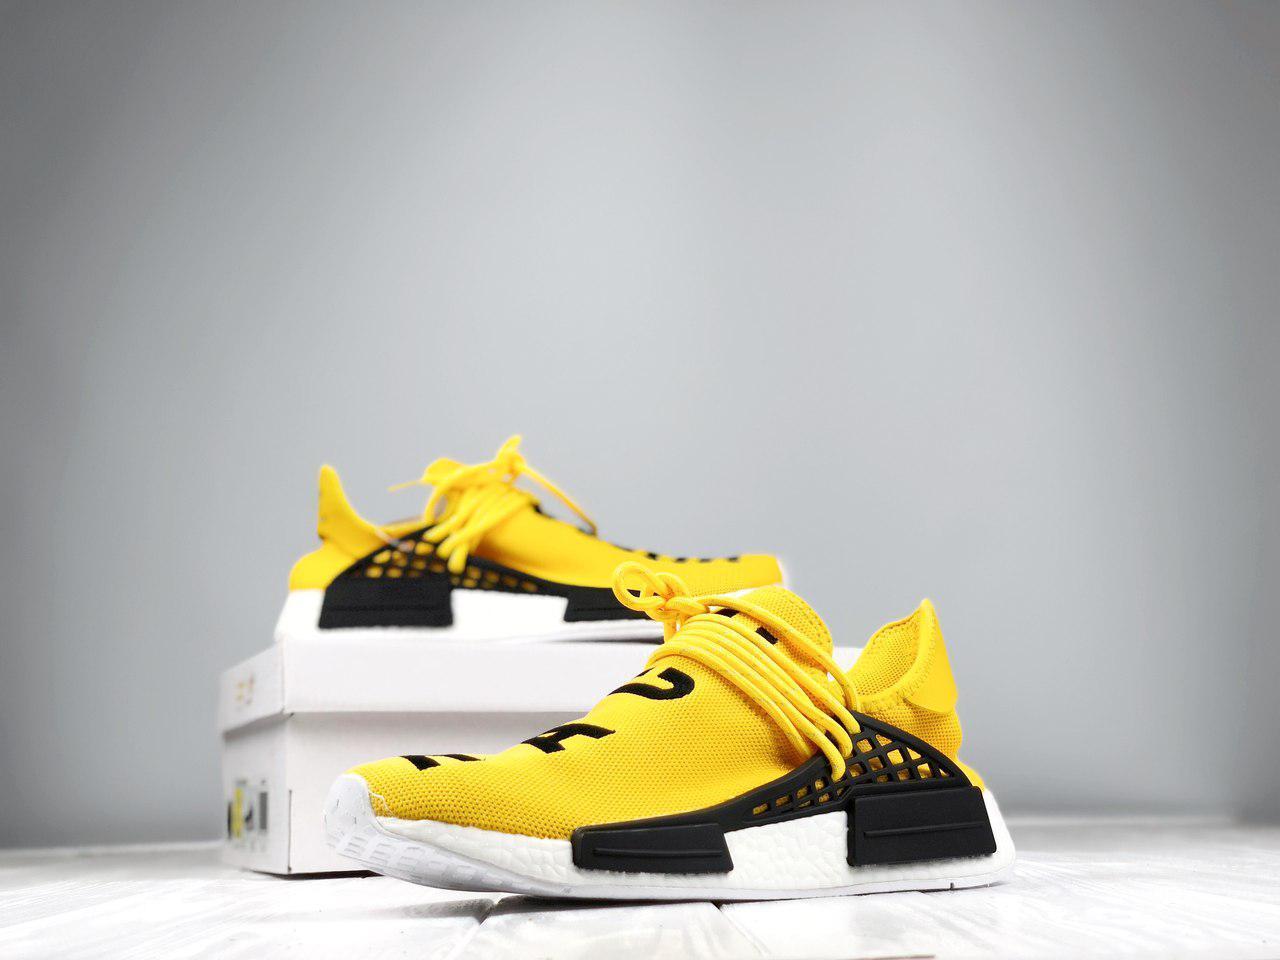 f9fa5655c9b97f Кроссовки Adidas NMD Pharrell Williams x 'Human Race' Yellow. B Живое фото  (Реплика ААА+)